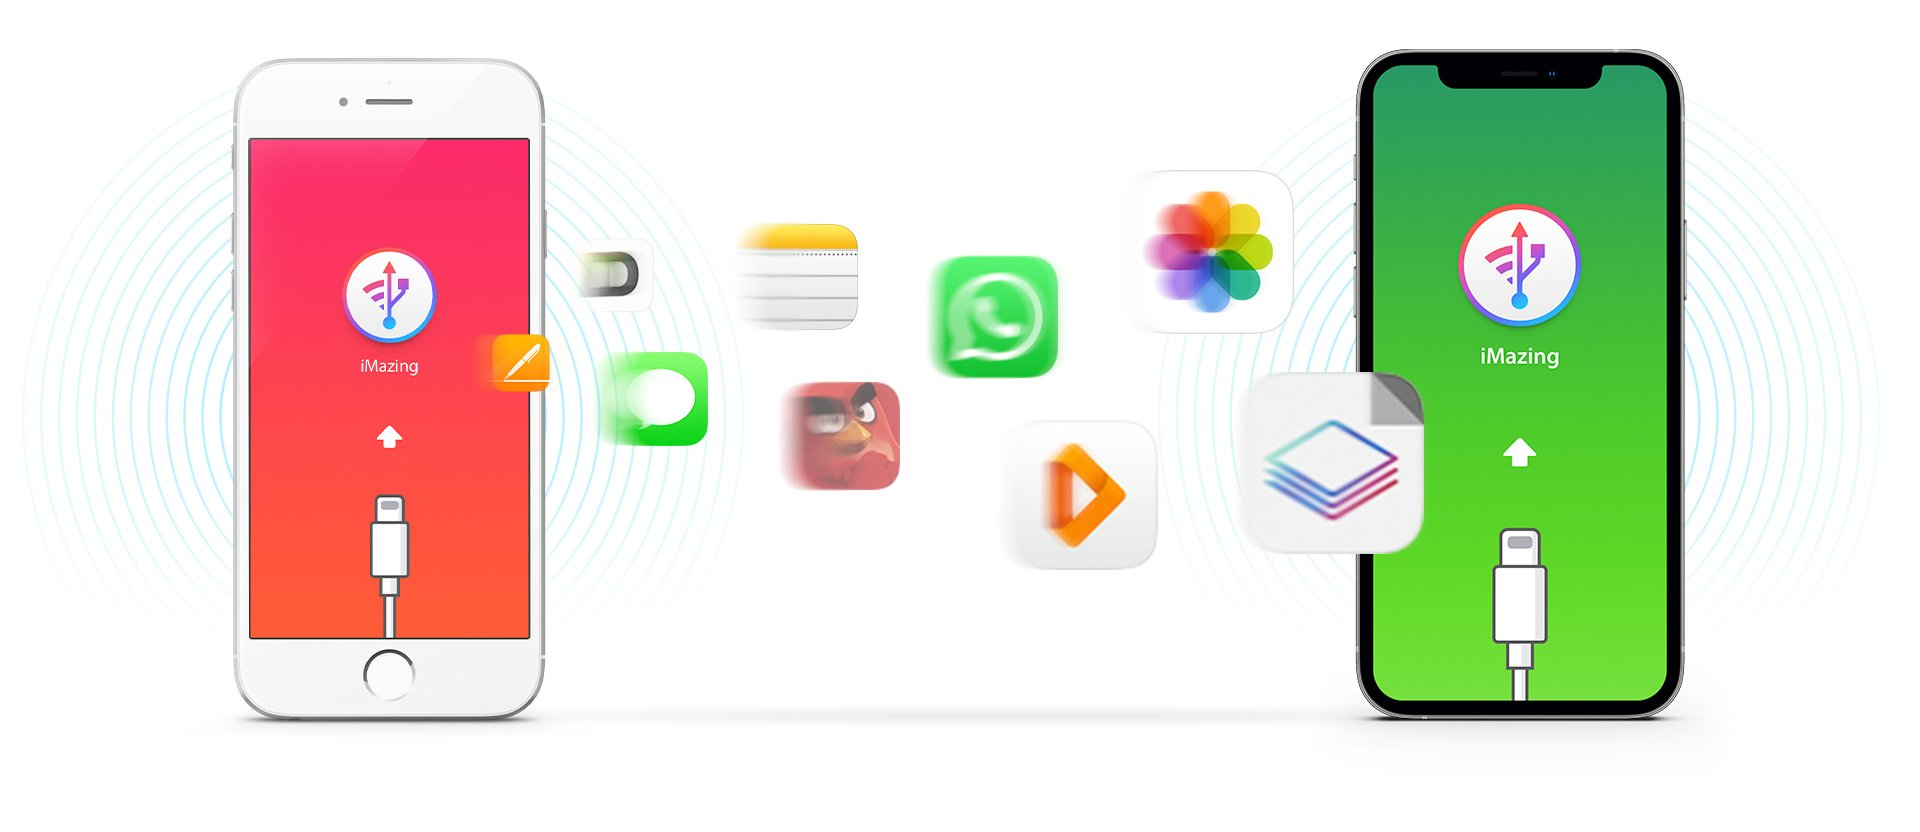 iMazing for Mac 2.4.0 破解版 – 优秀的iOS设备管理工具-麦氪派(WaitsUn.com | 爱情守望者)